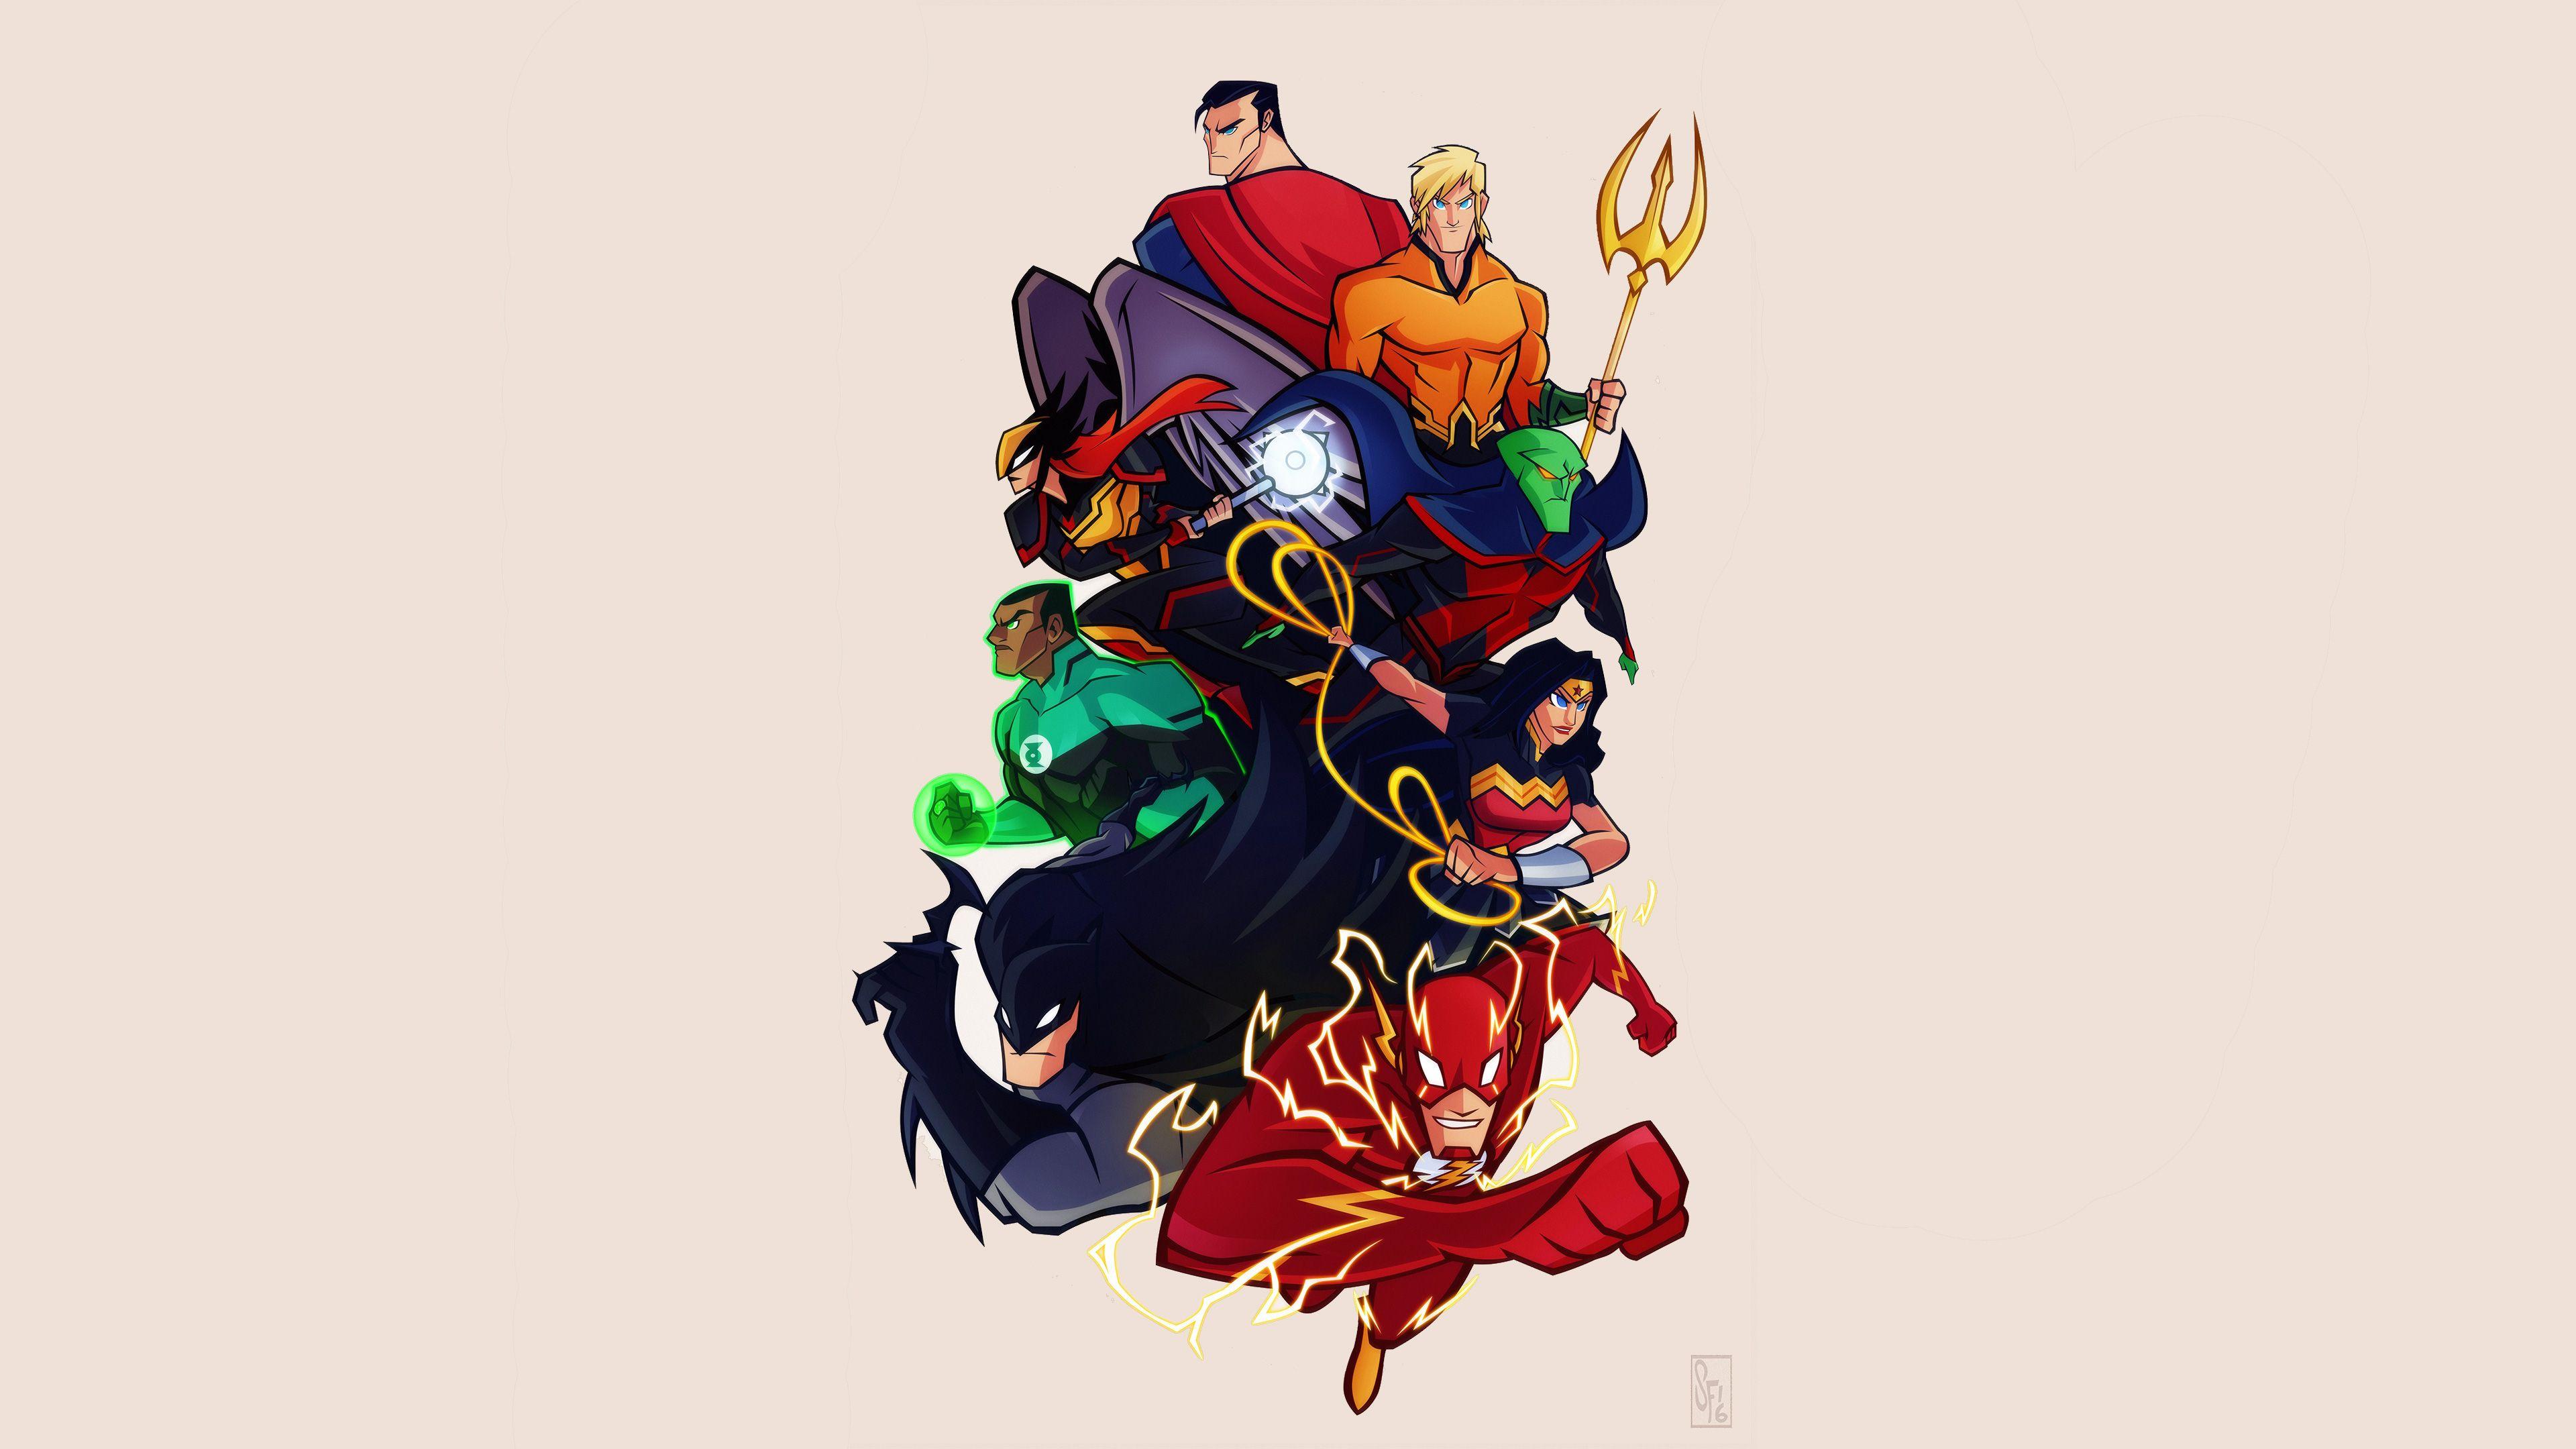 Justice League Cartoon Comic Artwork 4k Wonder Woman Wallpapers Superman Wallpapers Superheroes Wallpapers Cartoon Background Cartoon Wallpaper Cartoons Hd